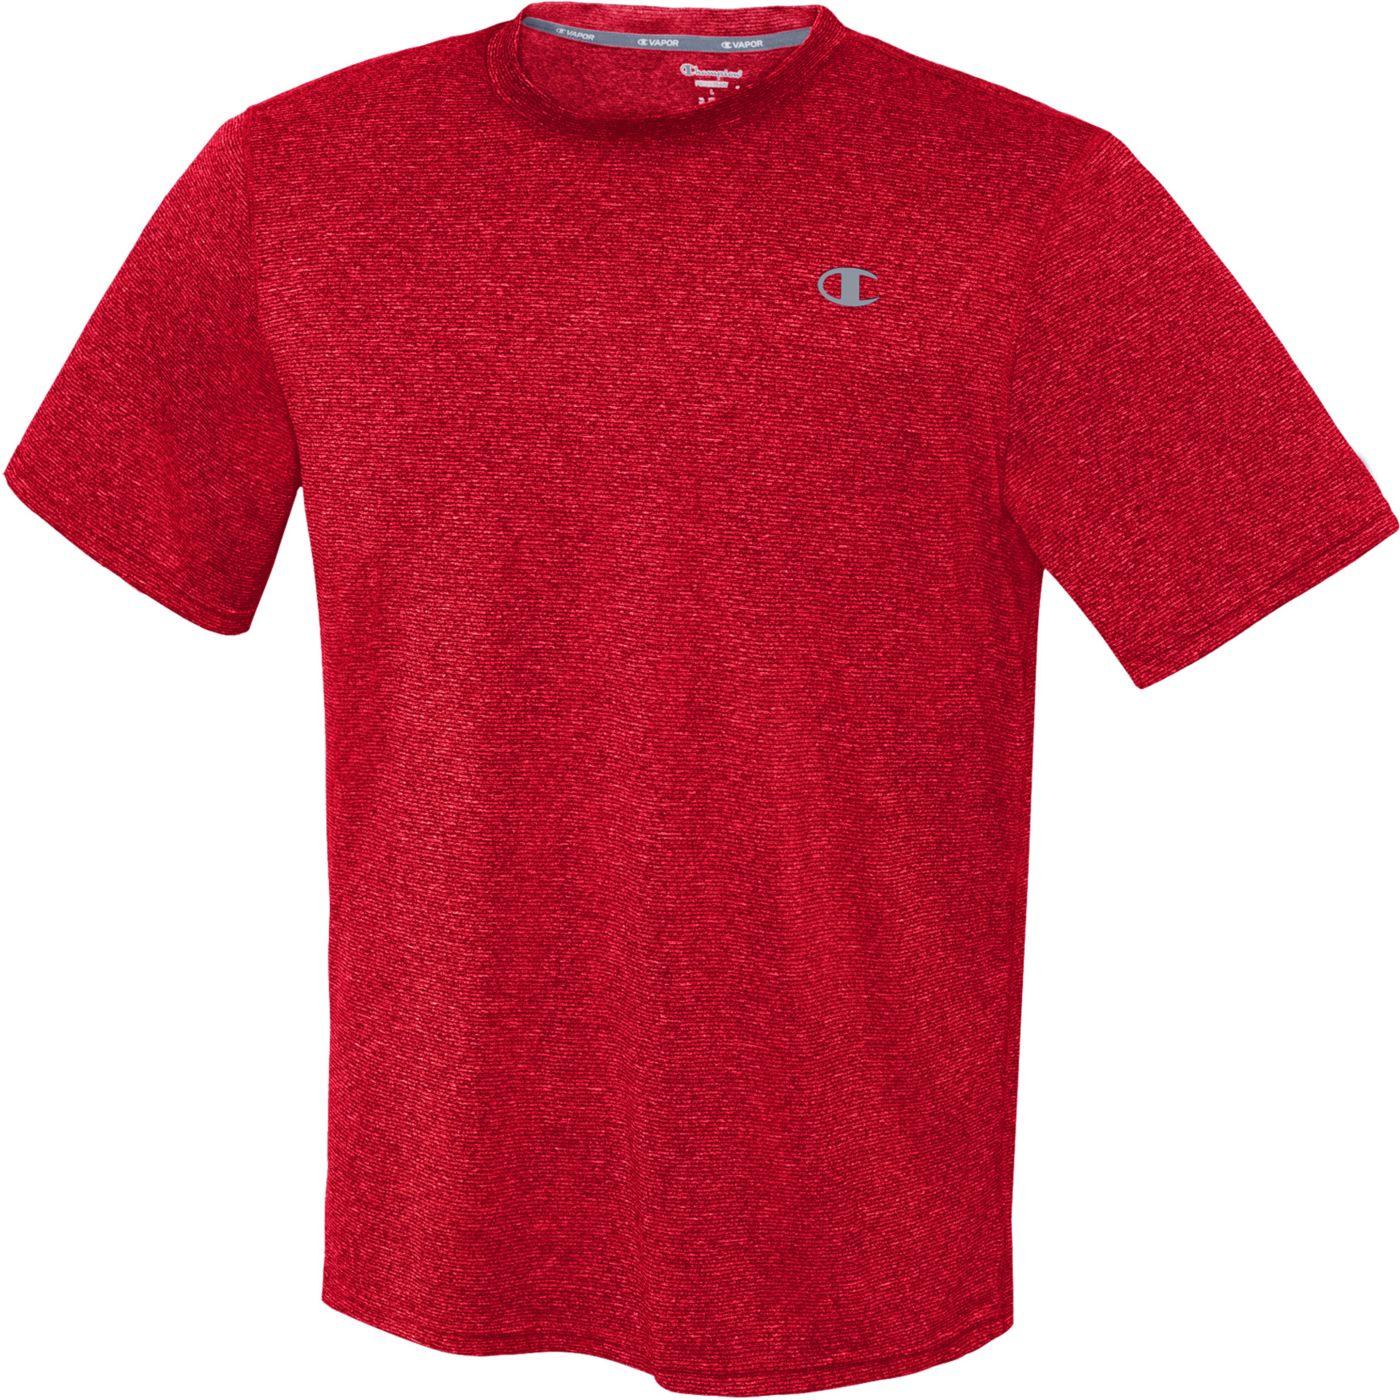 Champion Men's Vapor Heather T-Shirt